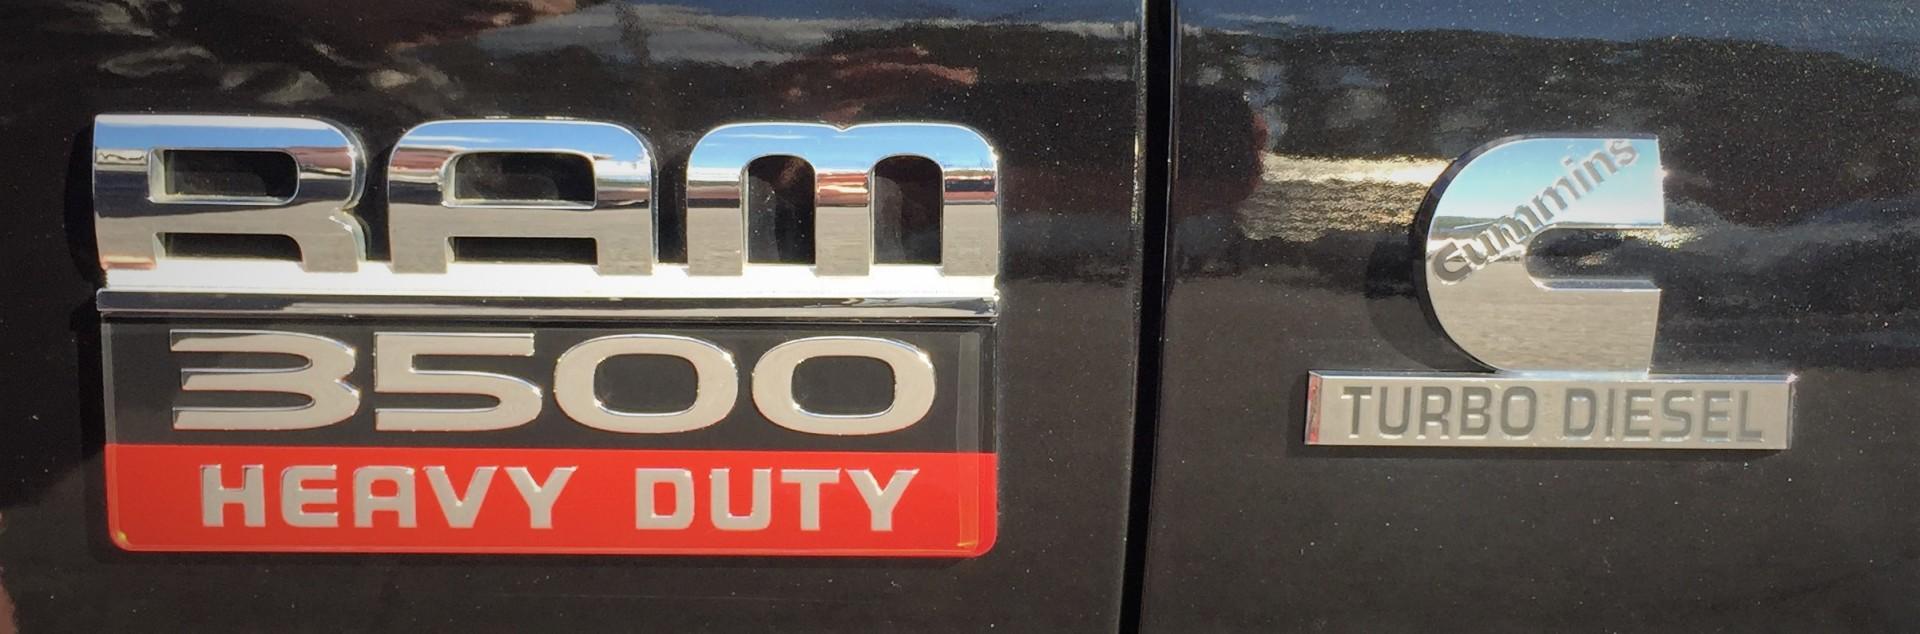 2007 Dodge Ram 3500 Exterior